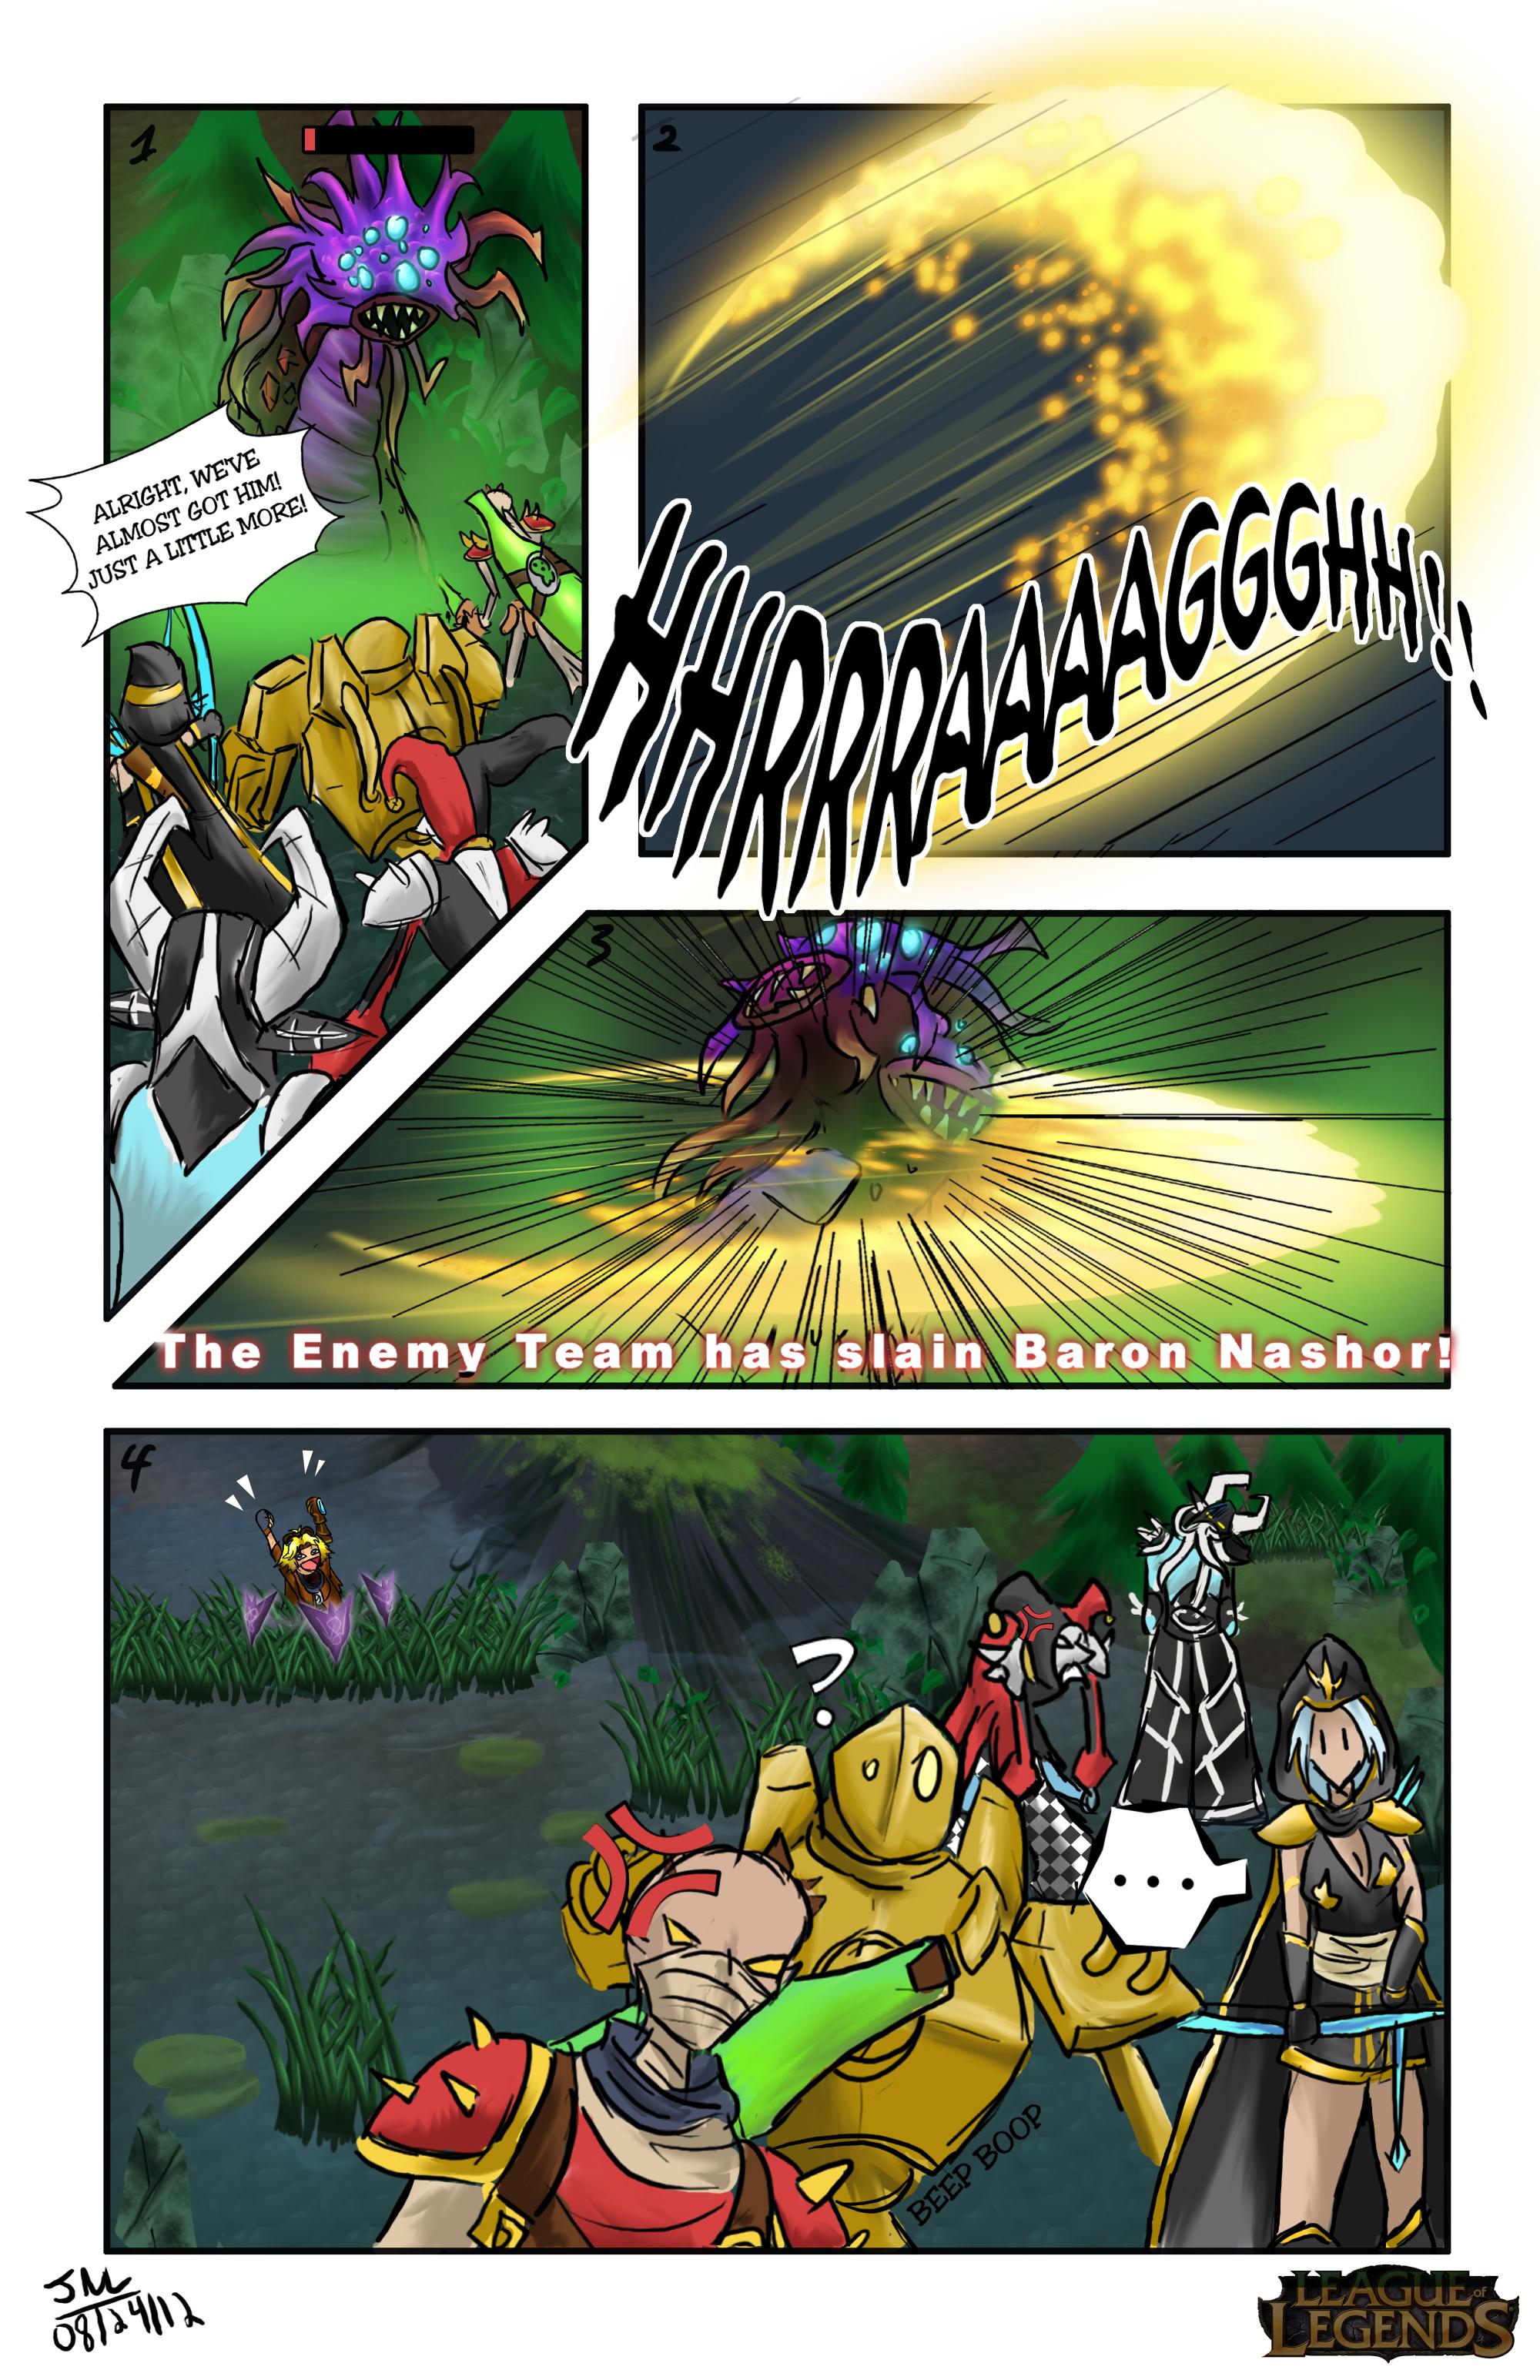 LoLz comic contest entry by PrincessKilvas